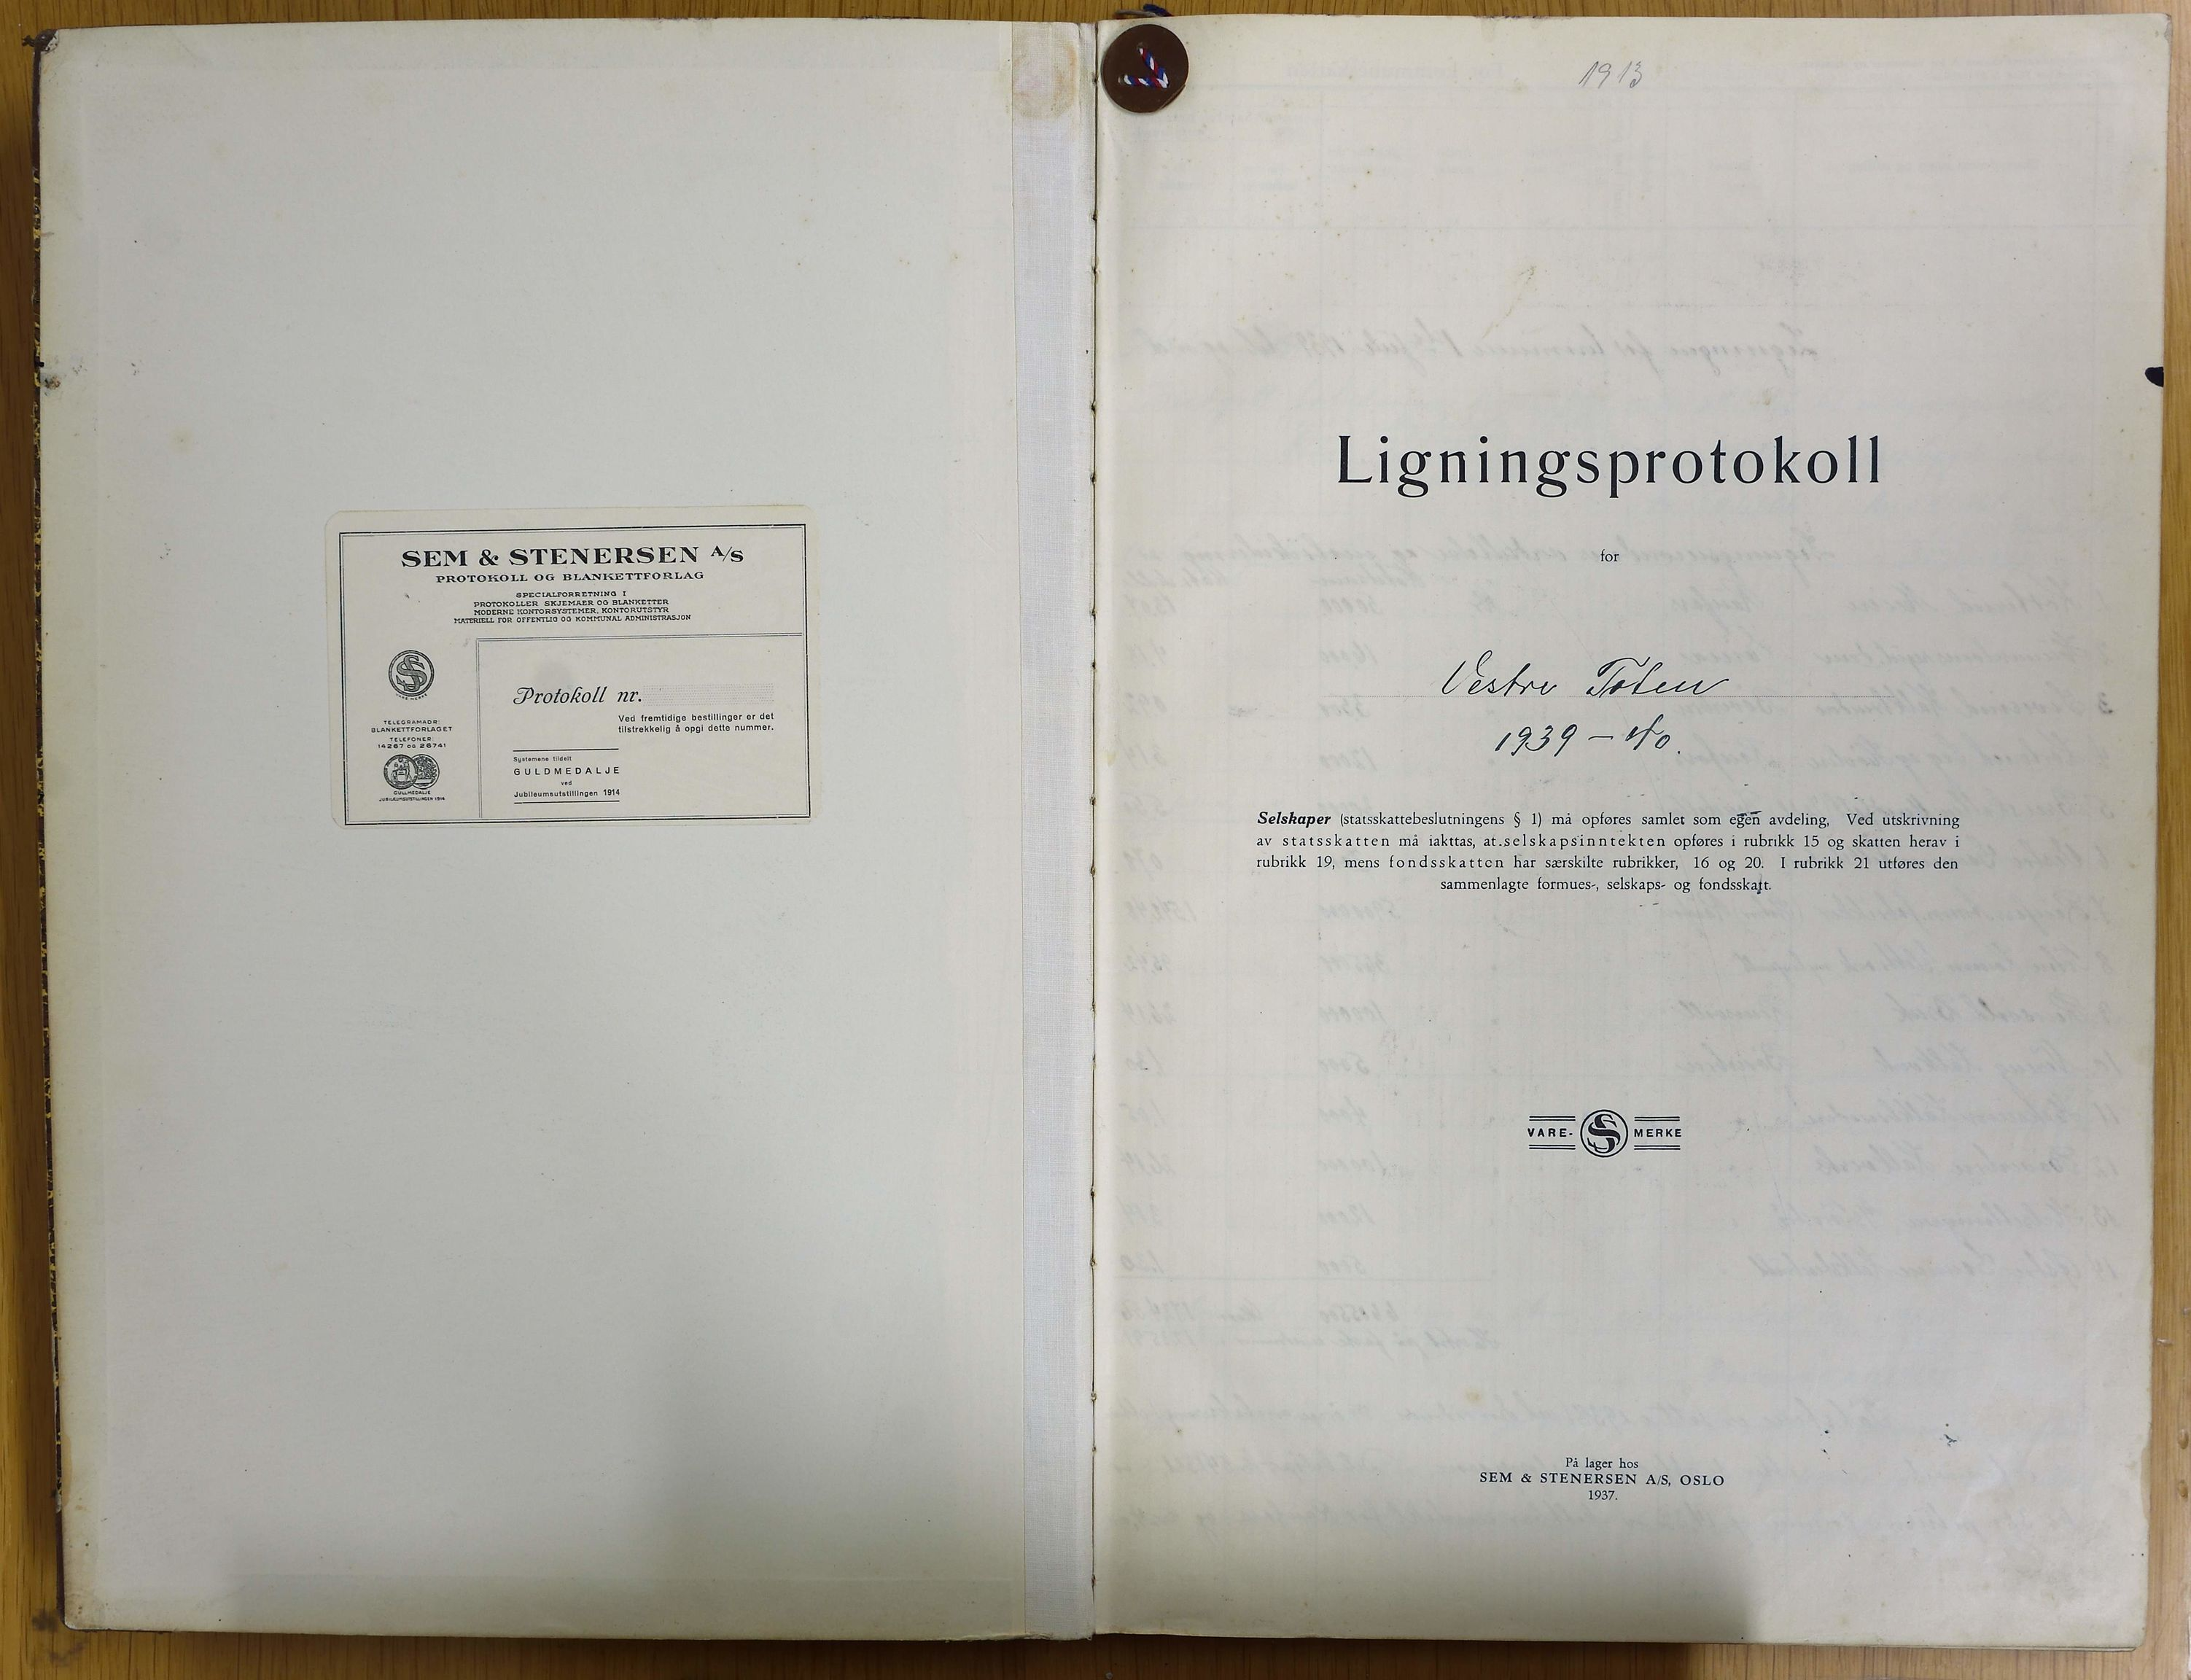 KVT, Vestre Toten kommunearkiv: Ligningsprotokoll for Vestre Toten kommune 1939-1940, 1939-1940